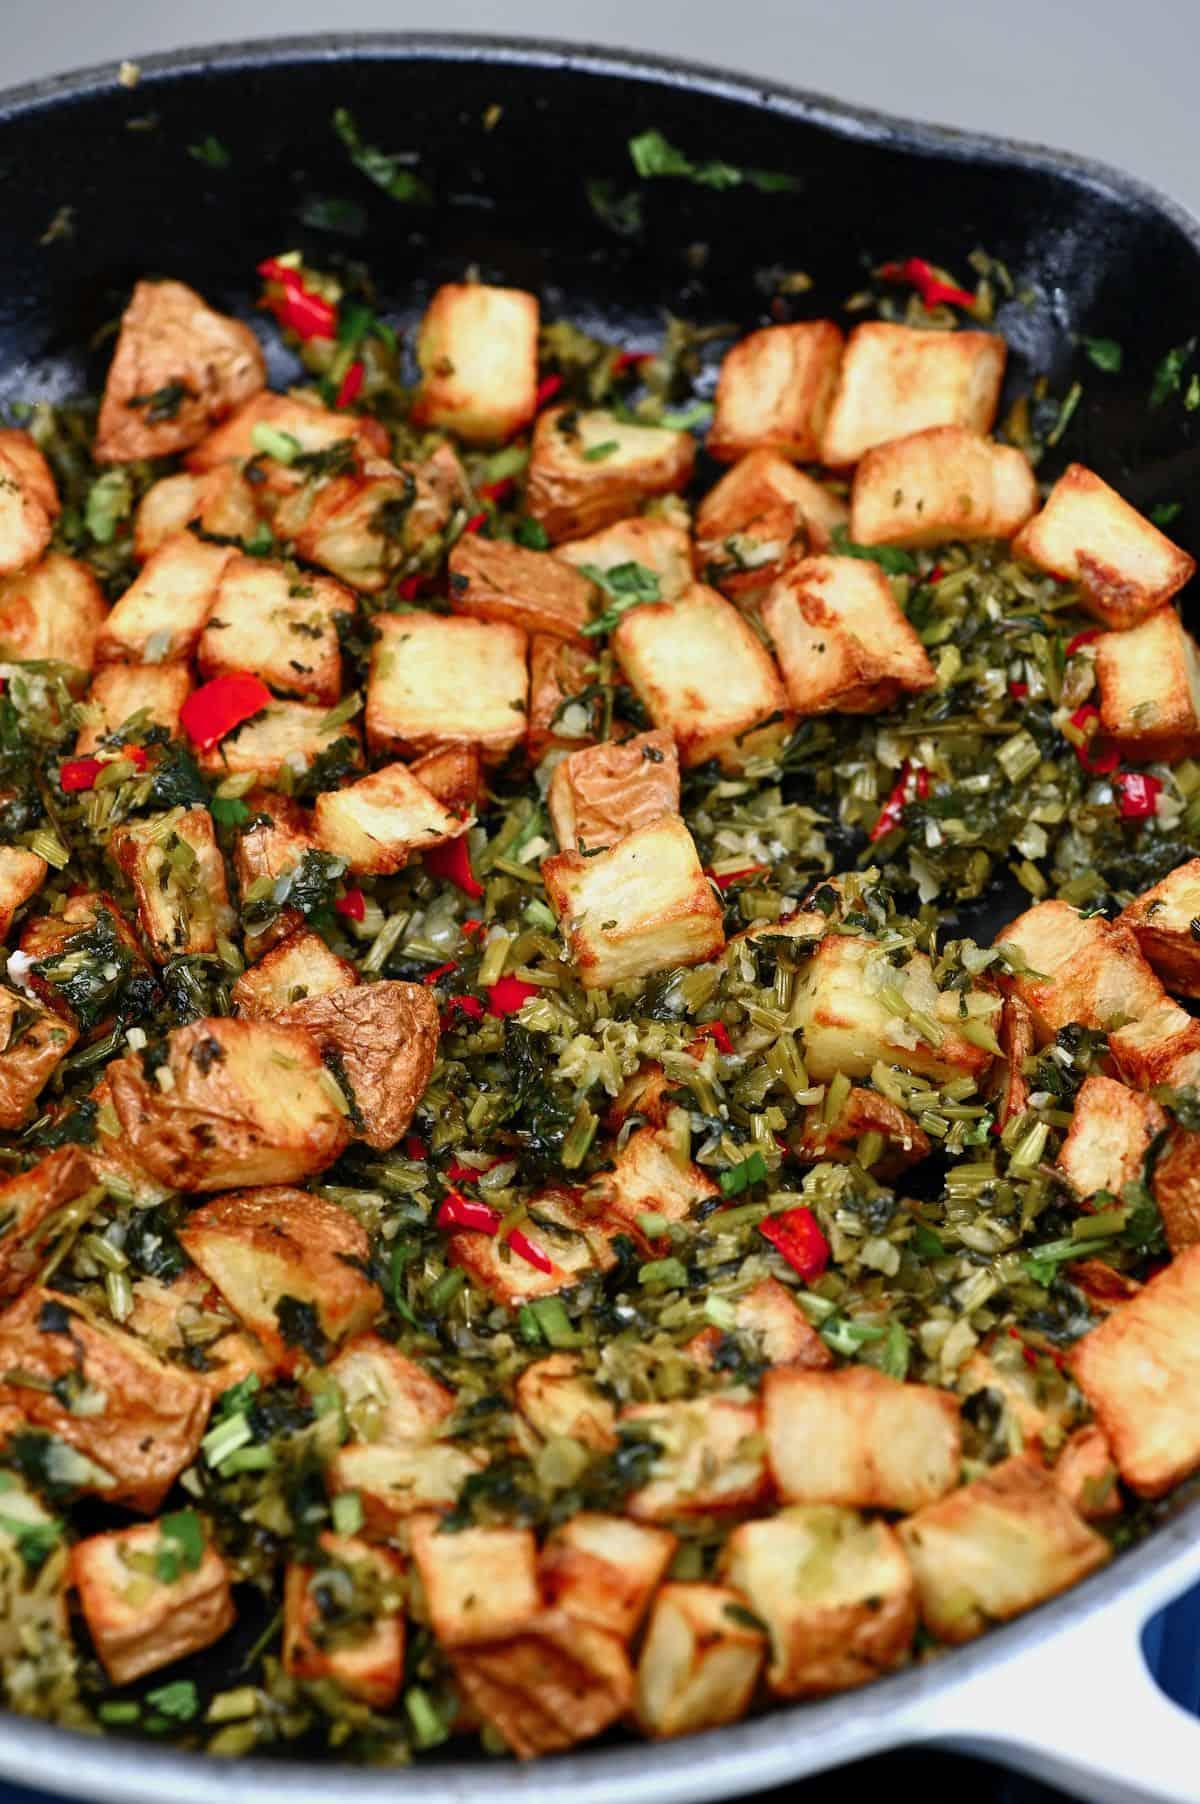 Batata harrah with sautéed cilantro in a pan